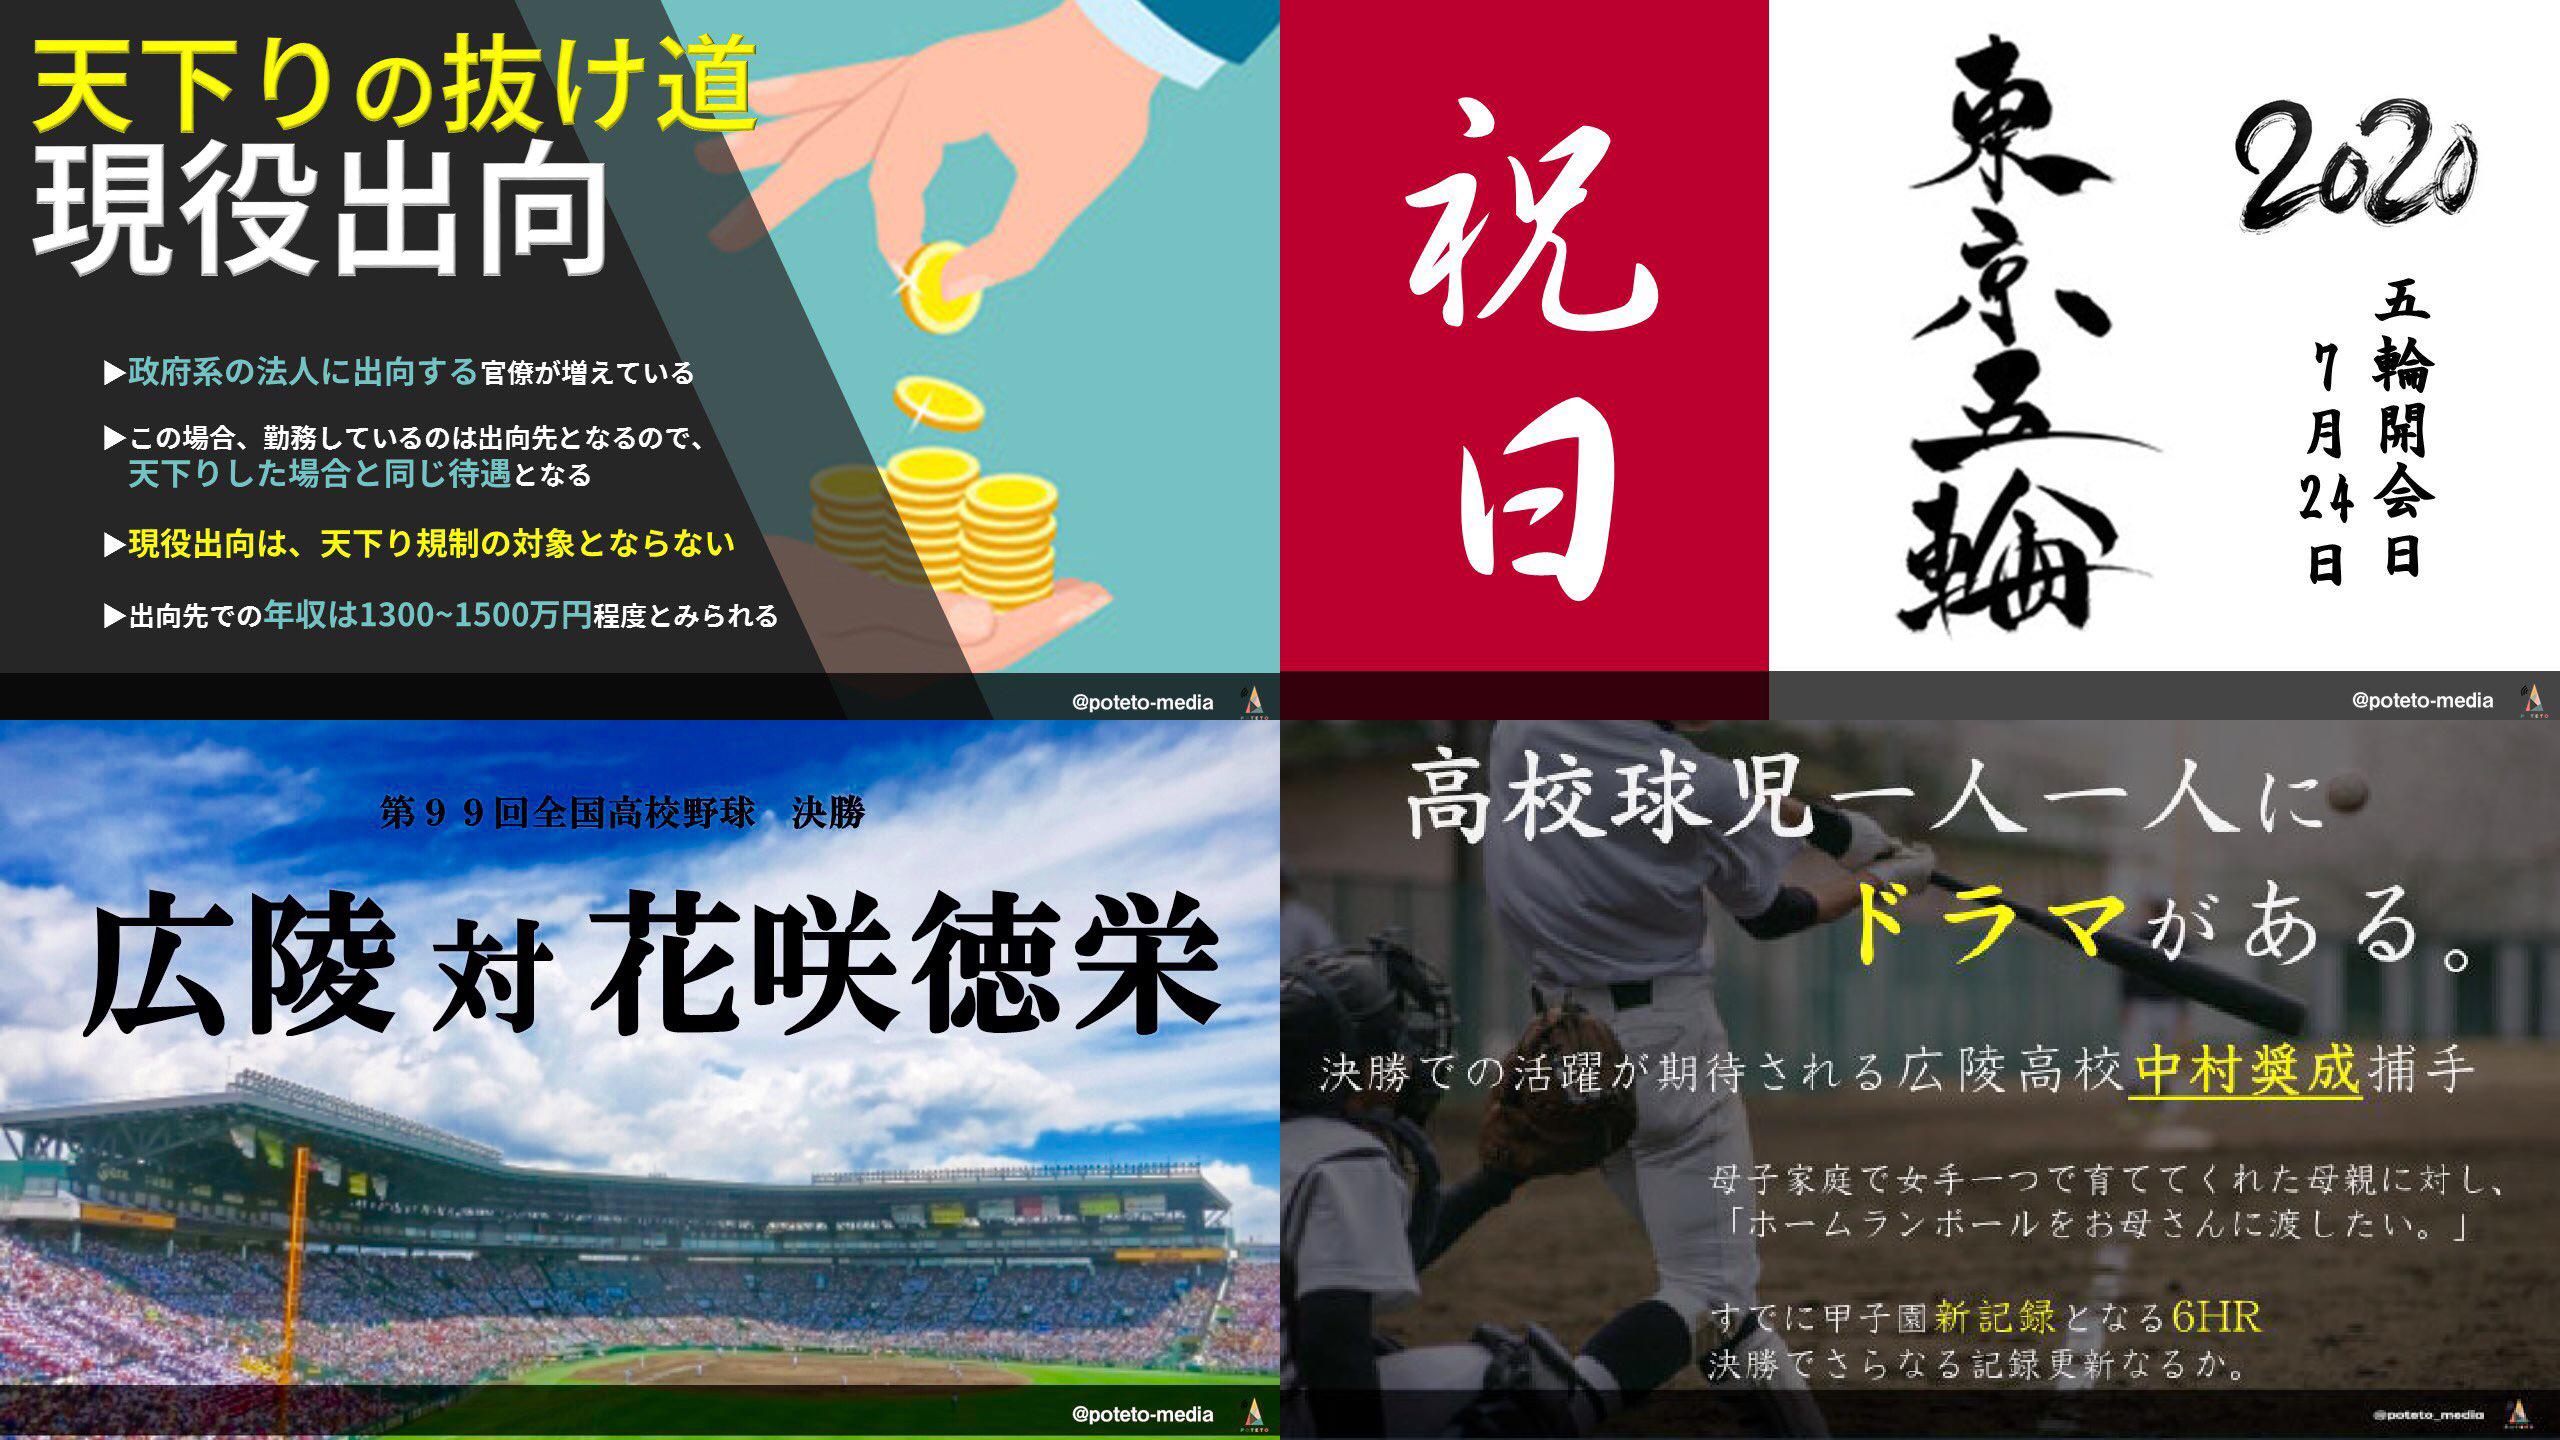 20170823 - 2017.08.23<br>朝日新聞のイチメンニュース